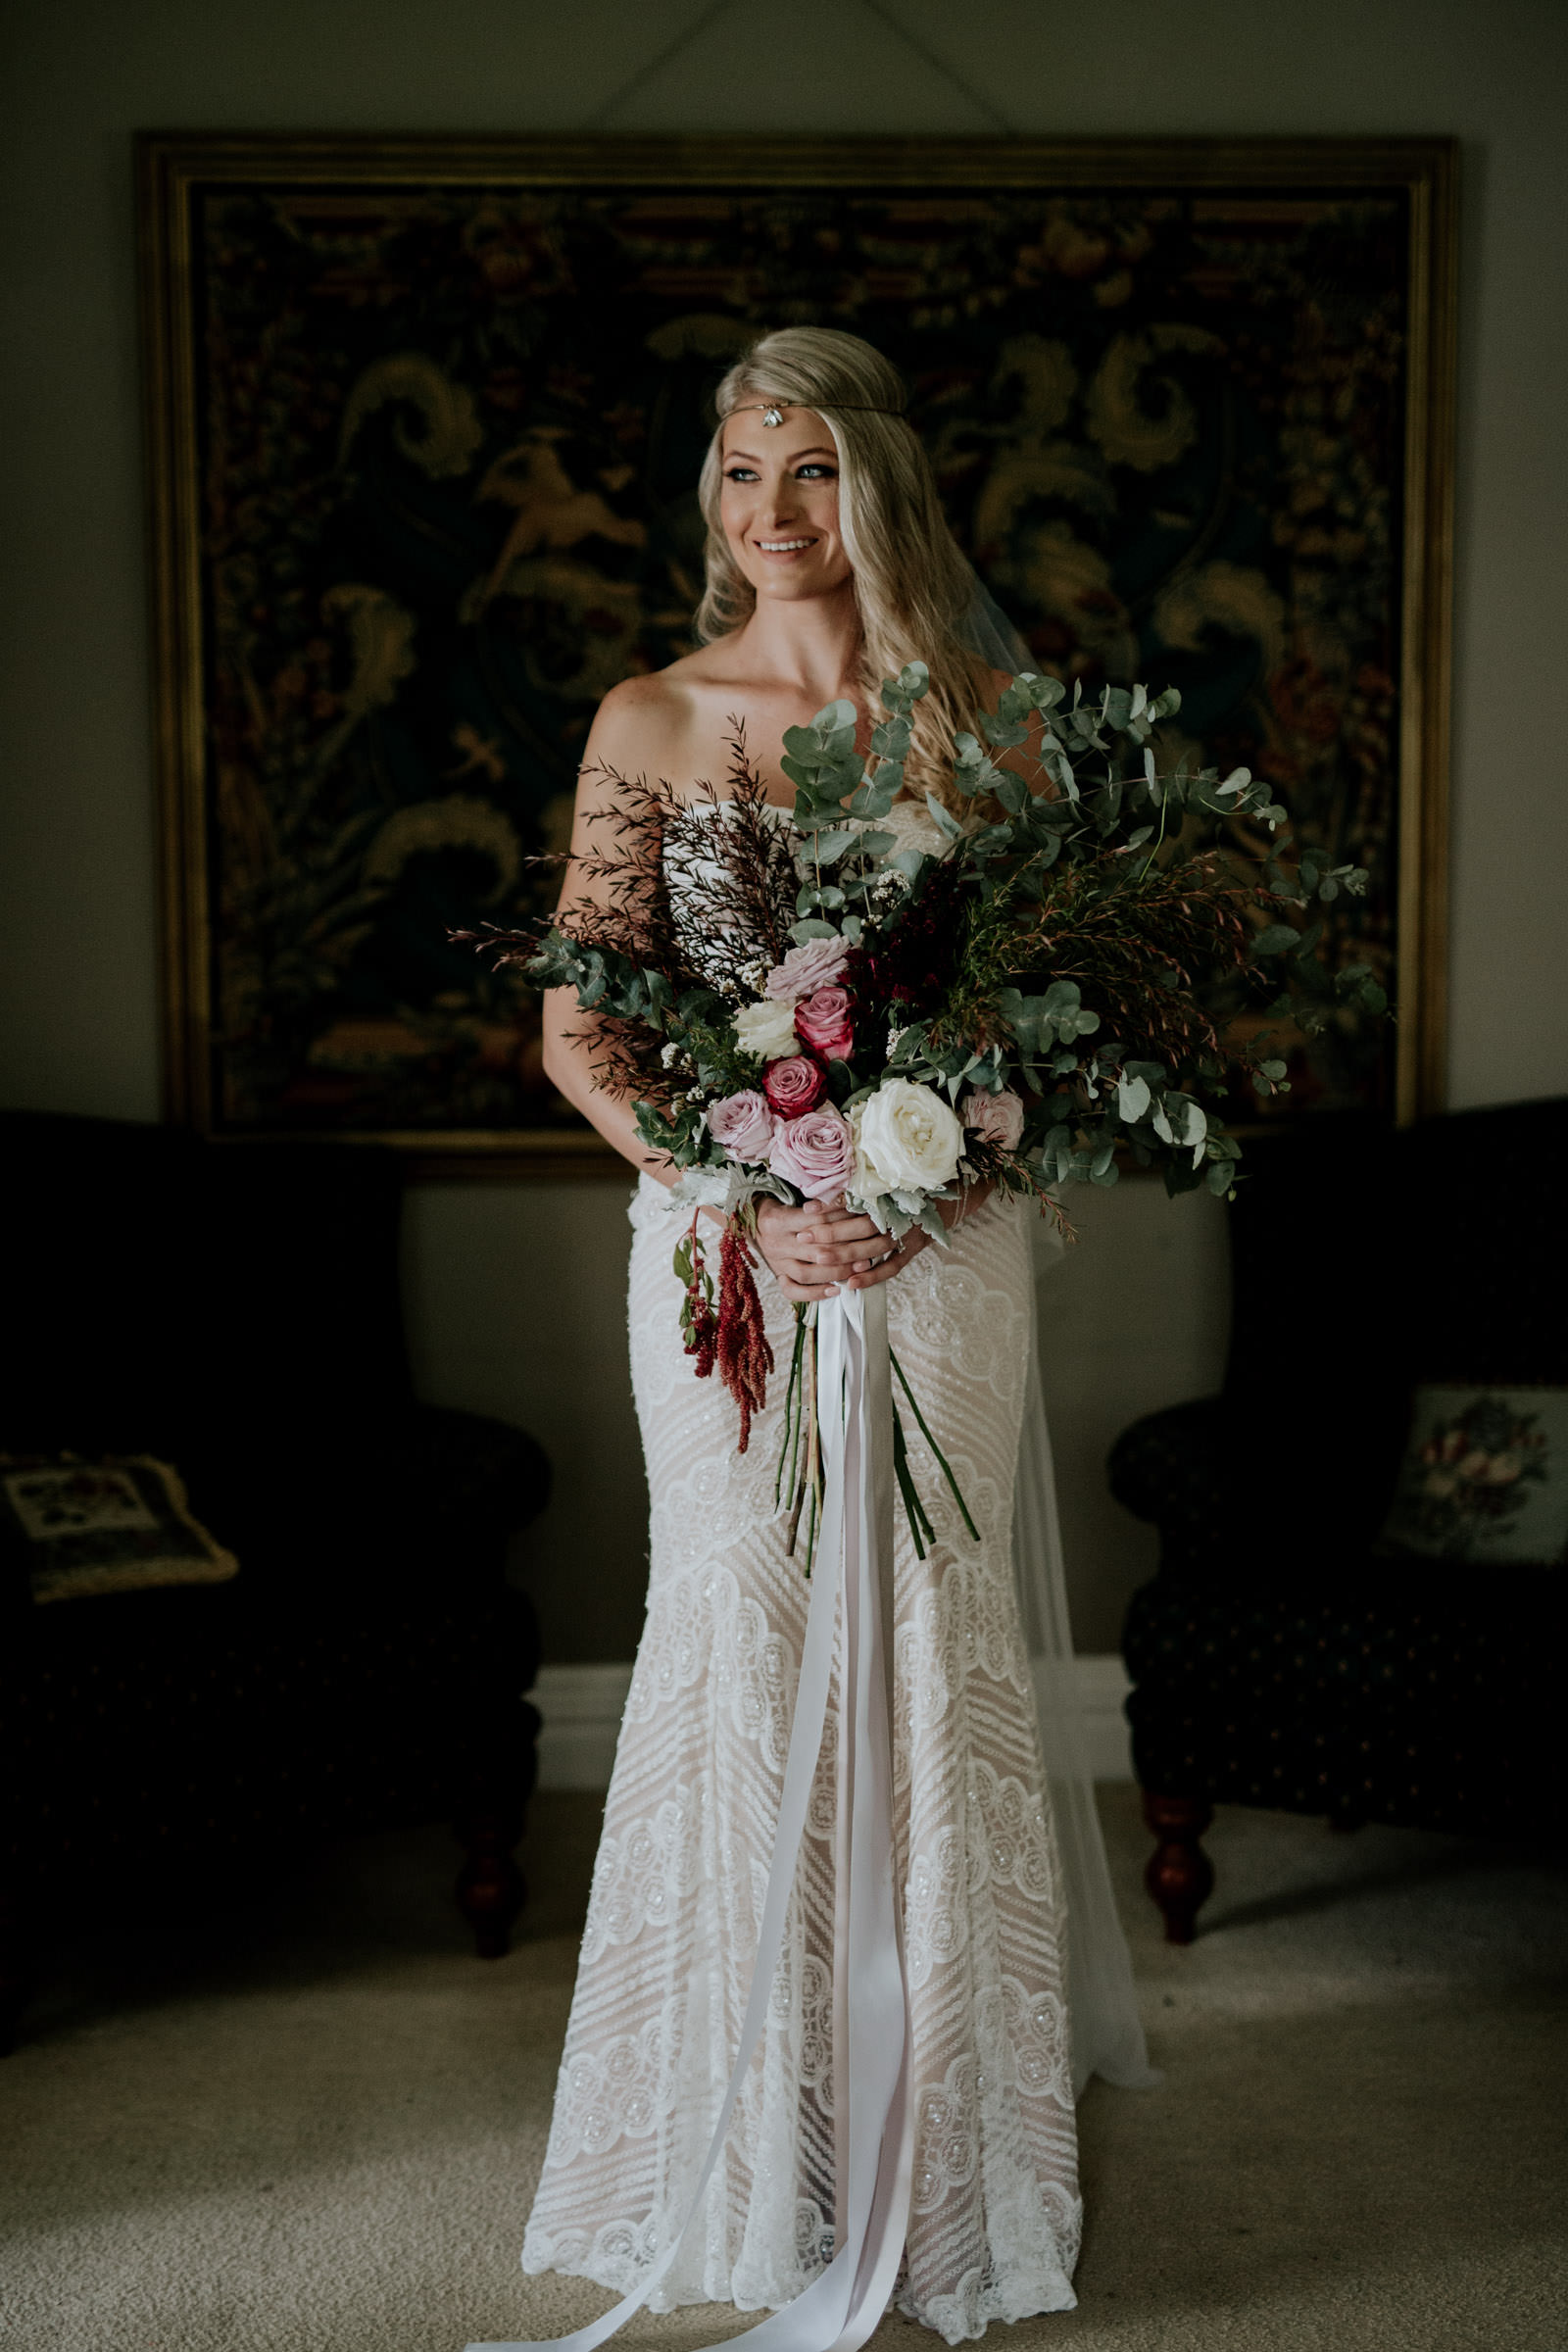 Emma+John+Far+South+Coast+Wedding+Festivl+Glamping+Bush-50.jpg